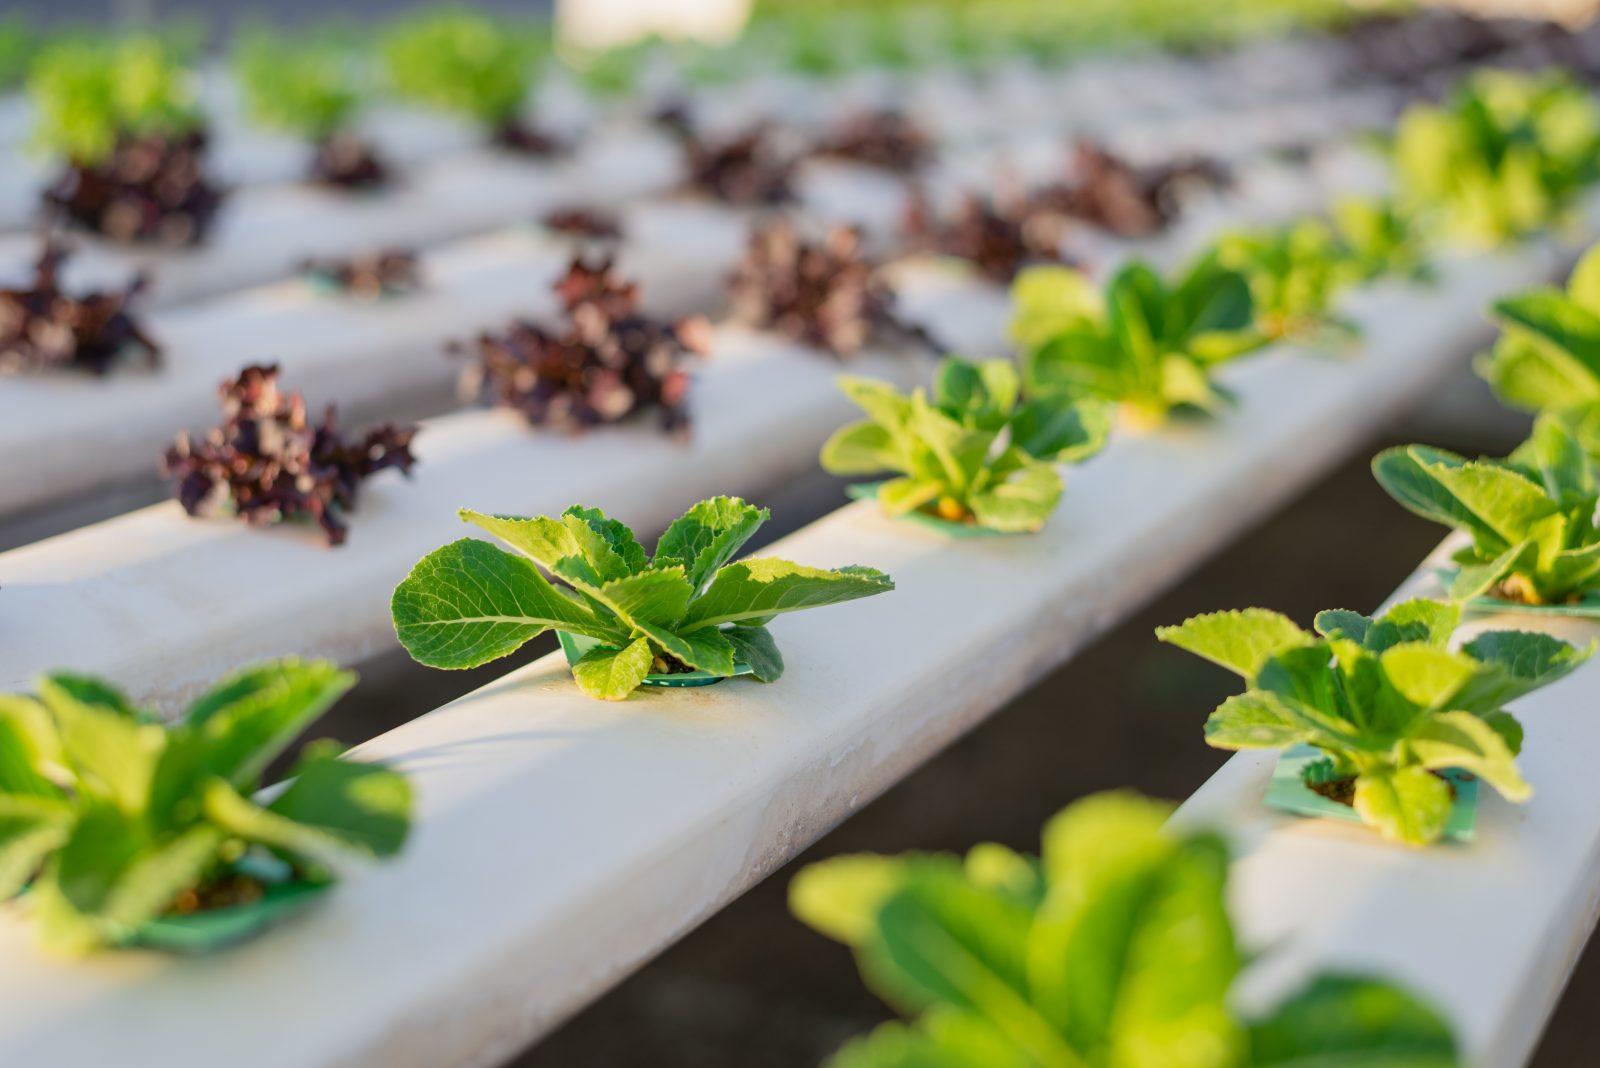 Hydroponics,Organic fresh harvested vegetables,Farmers working w